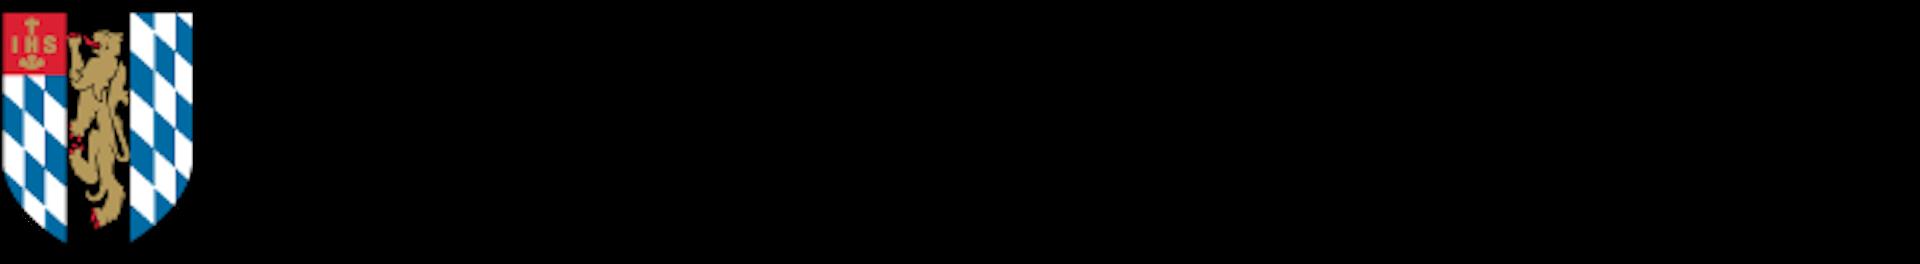 Logo 1435675629.png?ixlib=rb 1.1